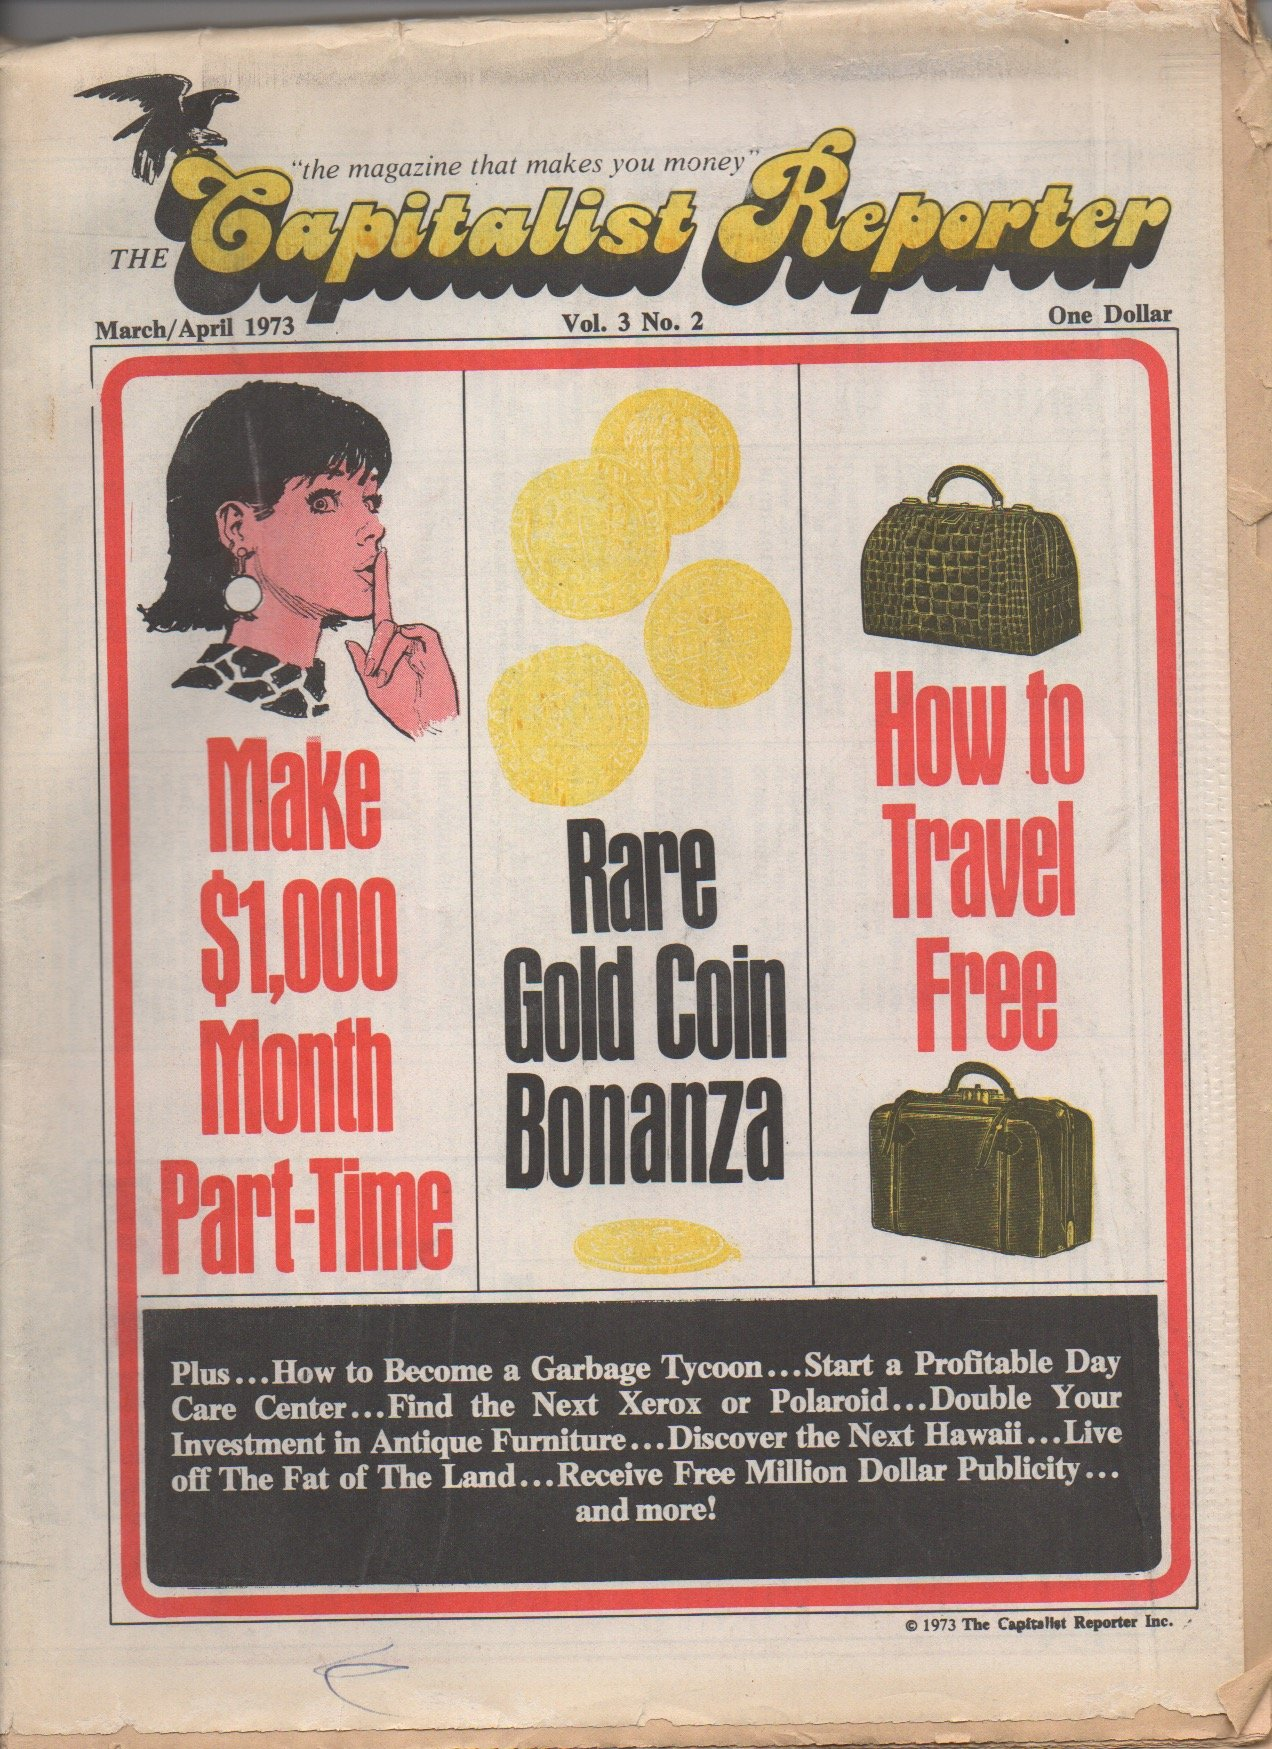 The Capitalist Reporter, vol  3, no  2 (March/April 1973